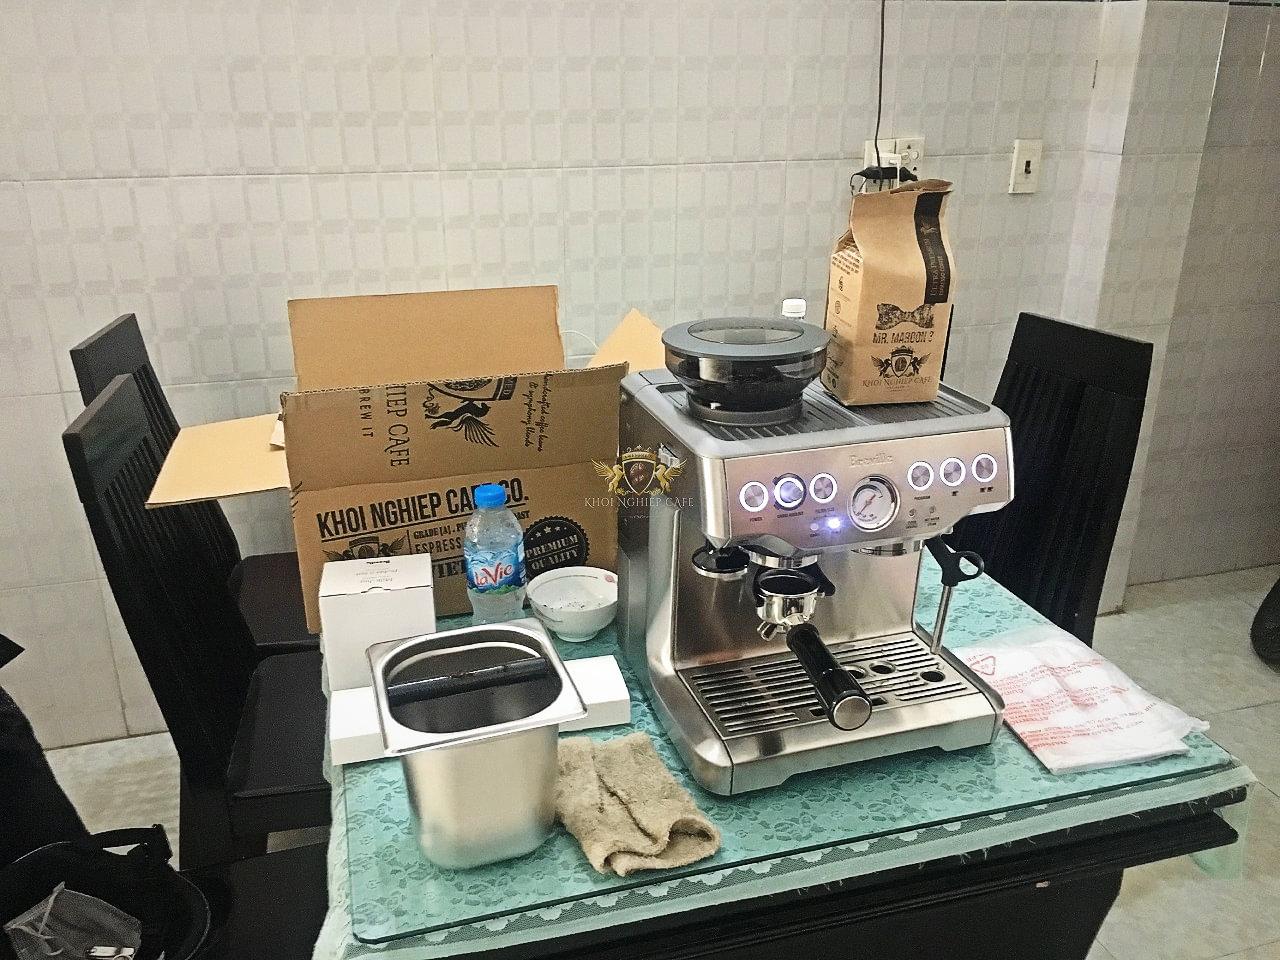 Mua ban may pha cafe nho breville viet nam khoi nghiep cafe quan 5 ho chi minh 5